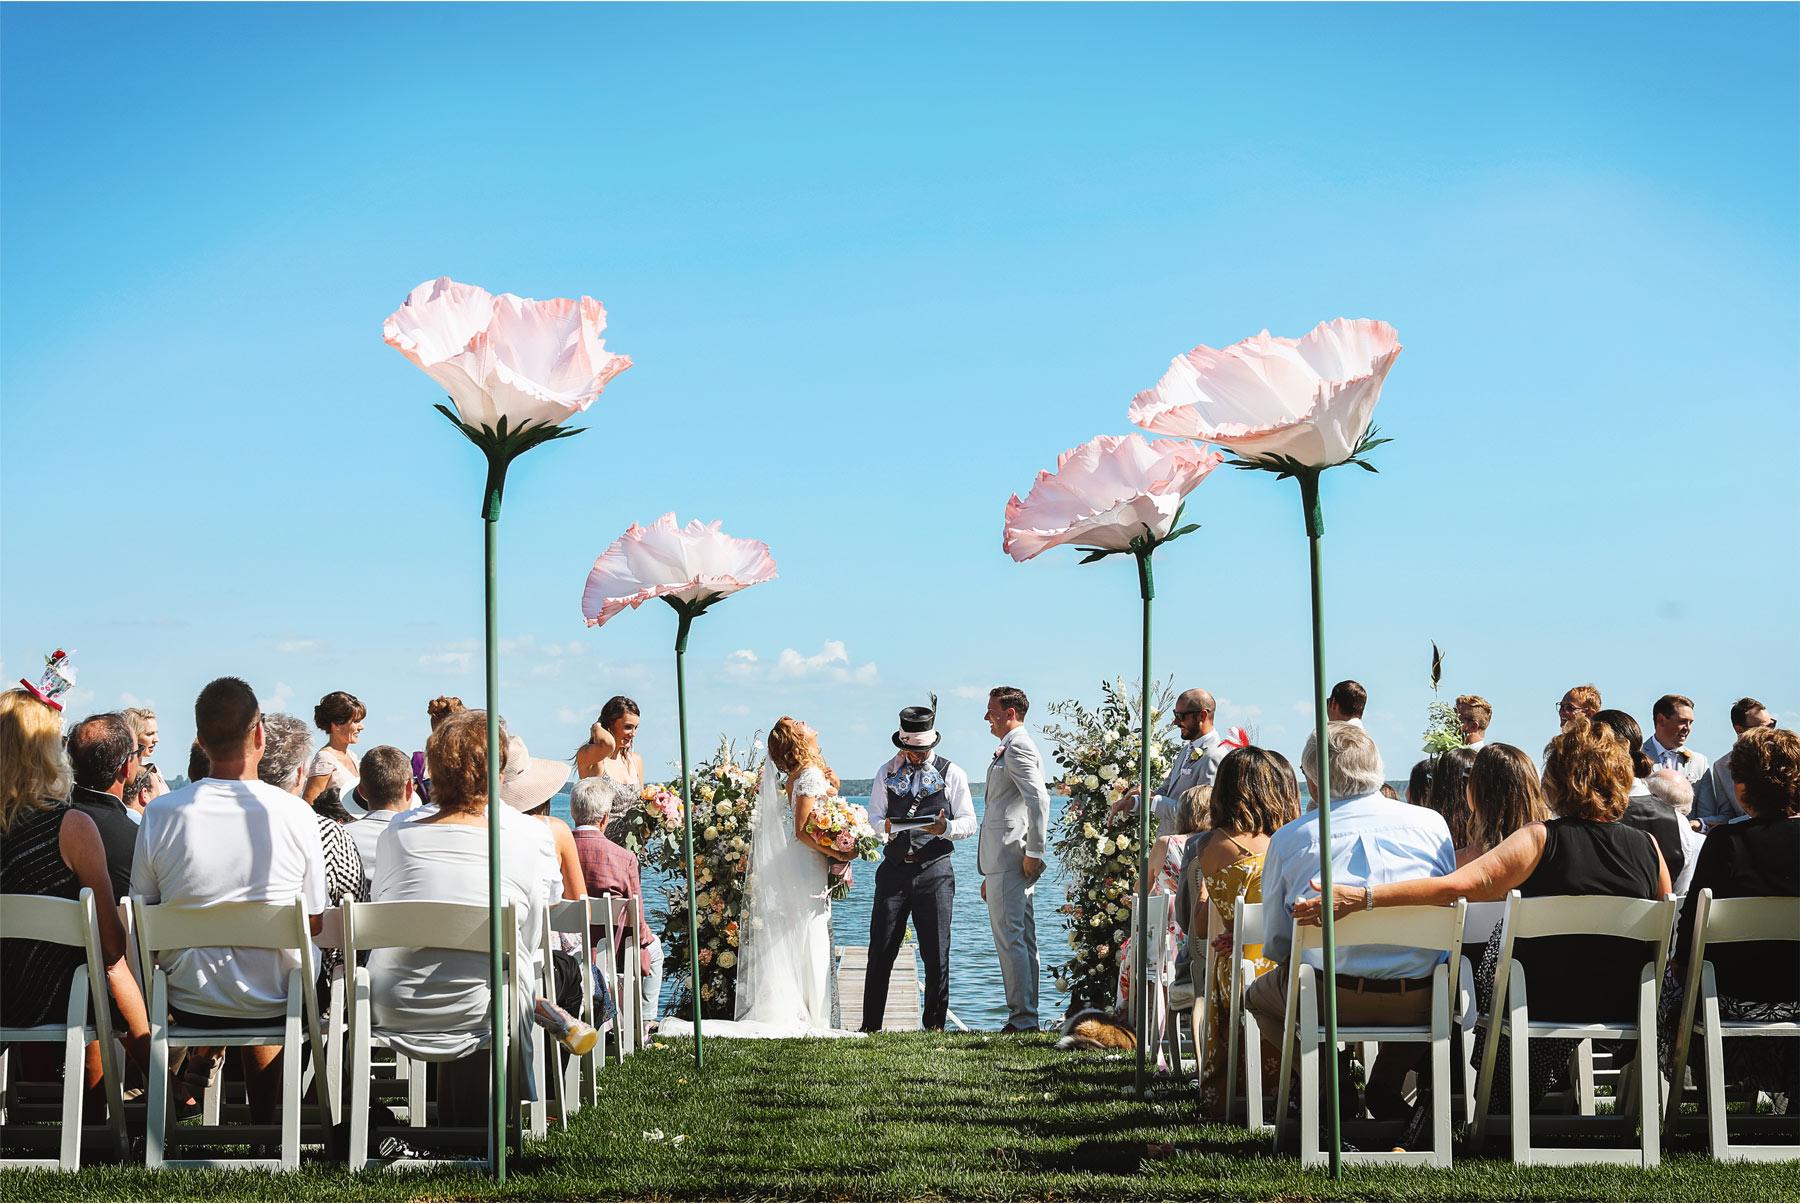 12-Vick-Photography-Wedding-Ottertail-Minnesota-Alice-in-Wonderland-Theme-Ceremony-Outdoor-Giant-Poppys-Bride-Groom-Tess-and-Greg.jpg